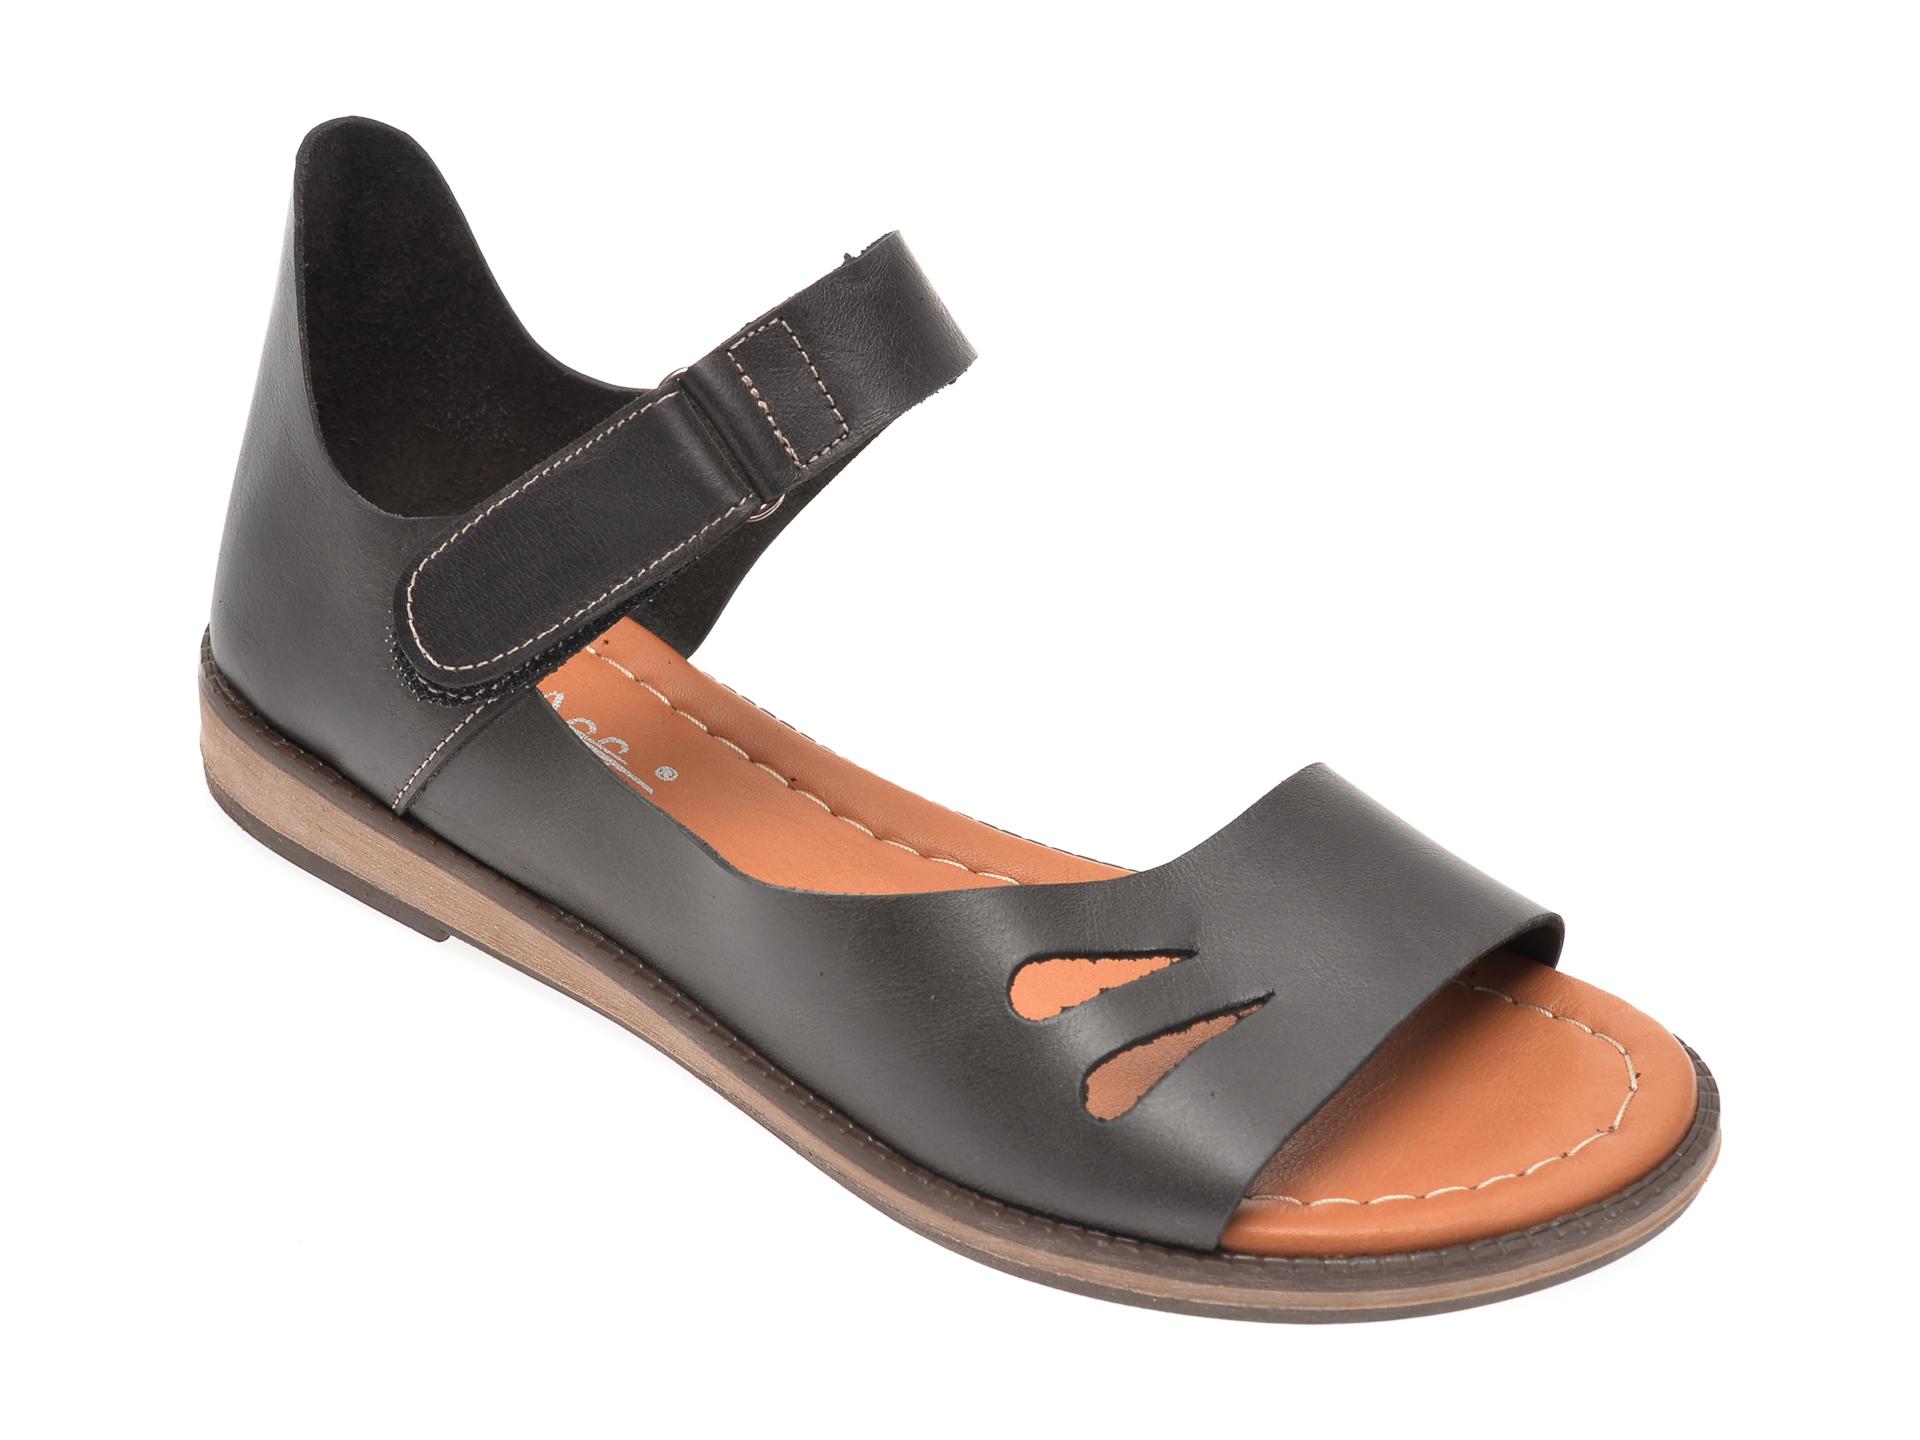 Sandale PASS COLLECTION negre, 1000K, din piele naturala